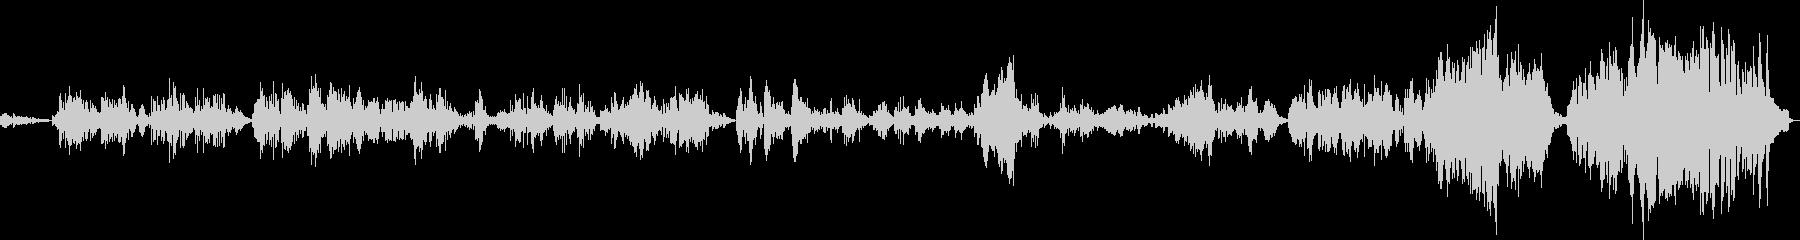 F・リスト:ラ・カンパネラ(ピアノソロ)の未再生の波形